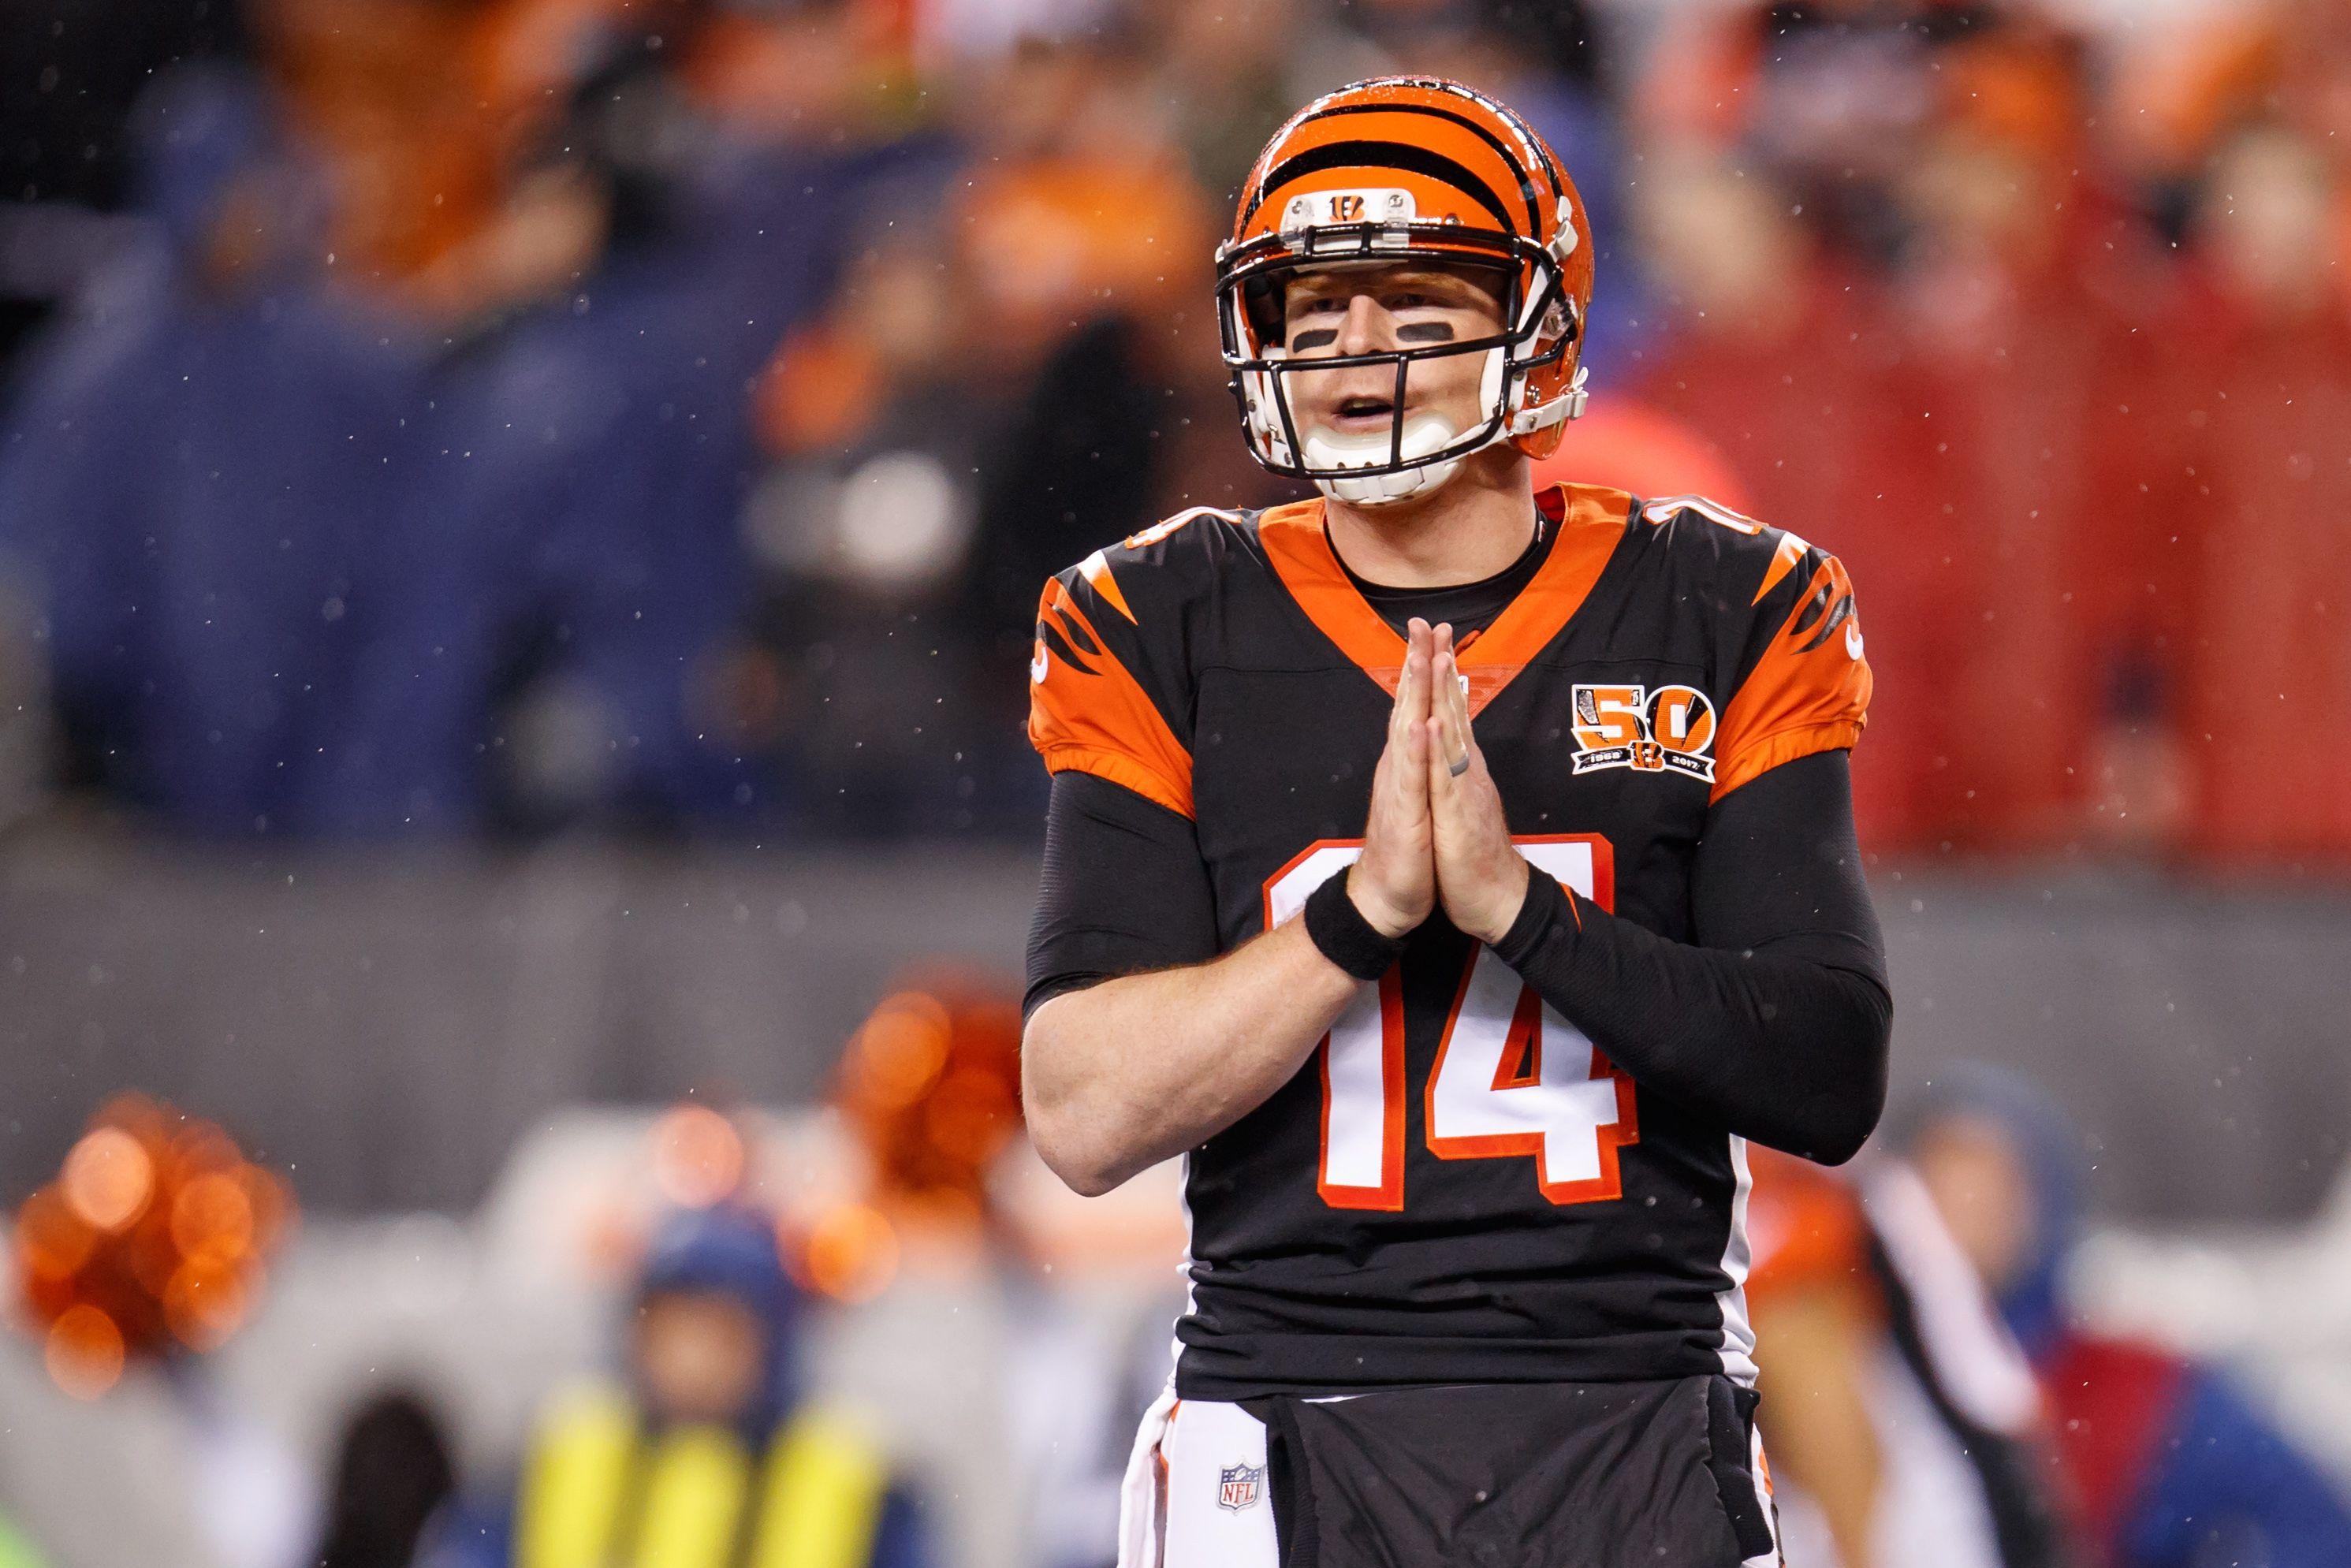 Cincinnati Bengals: Last chance saloon for Andy Dalton?